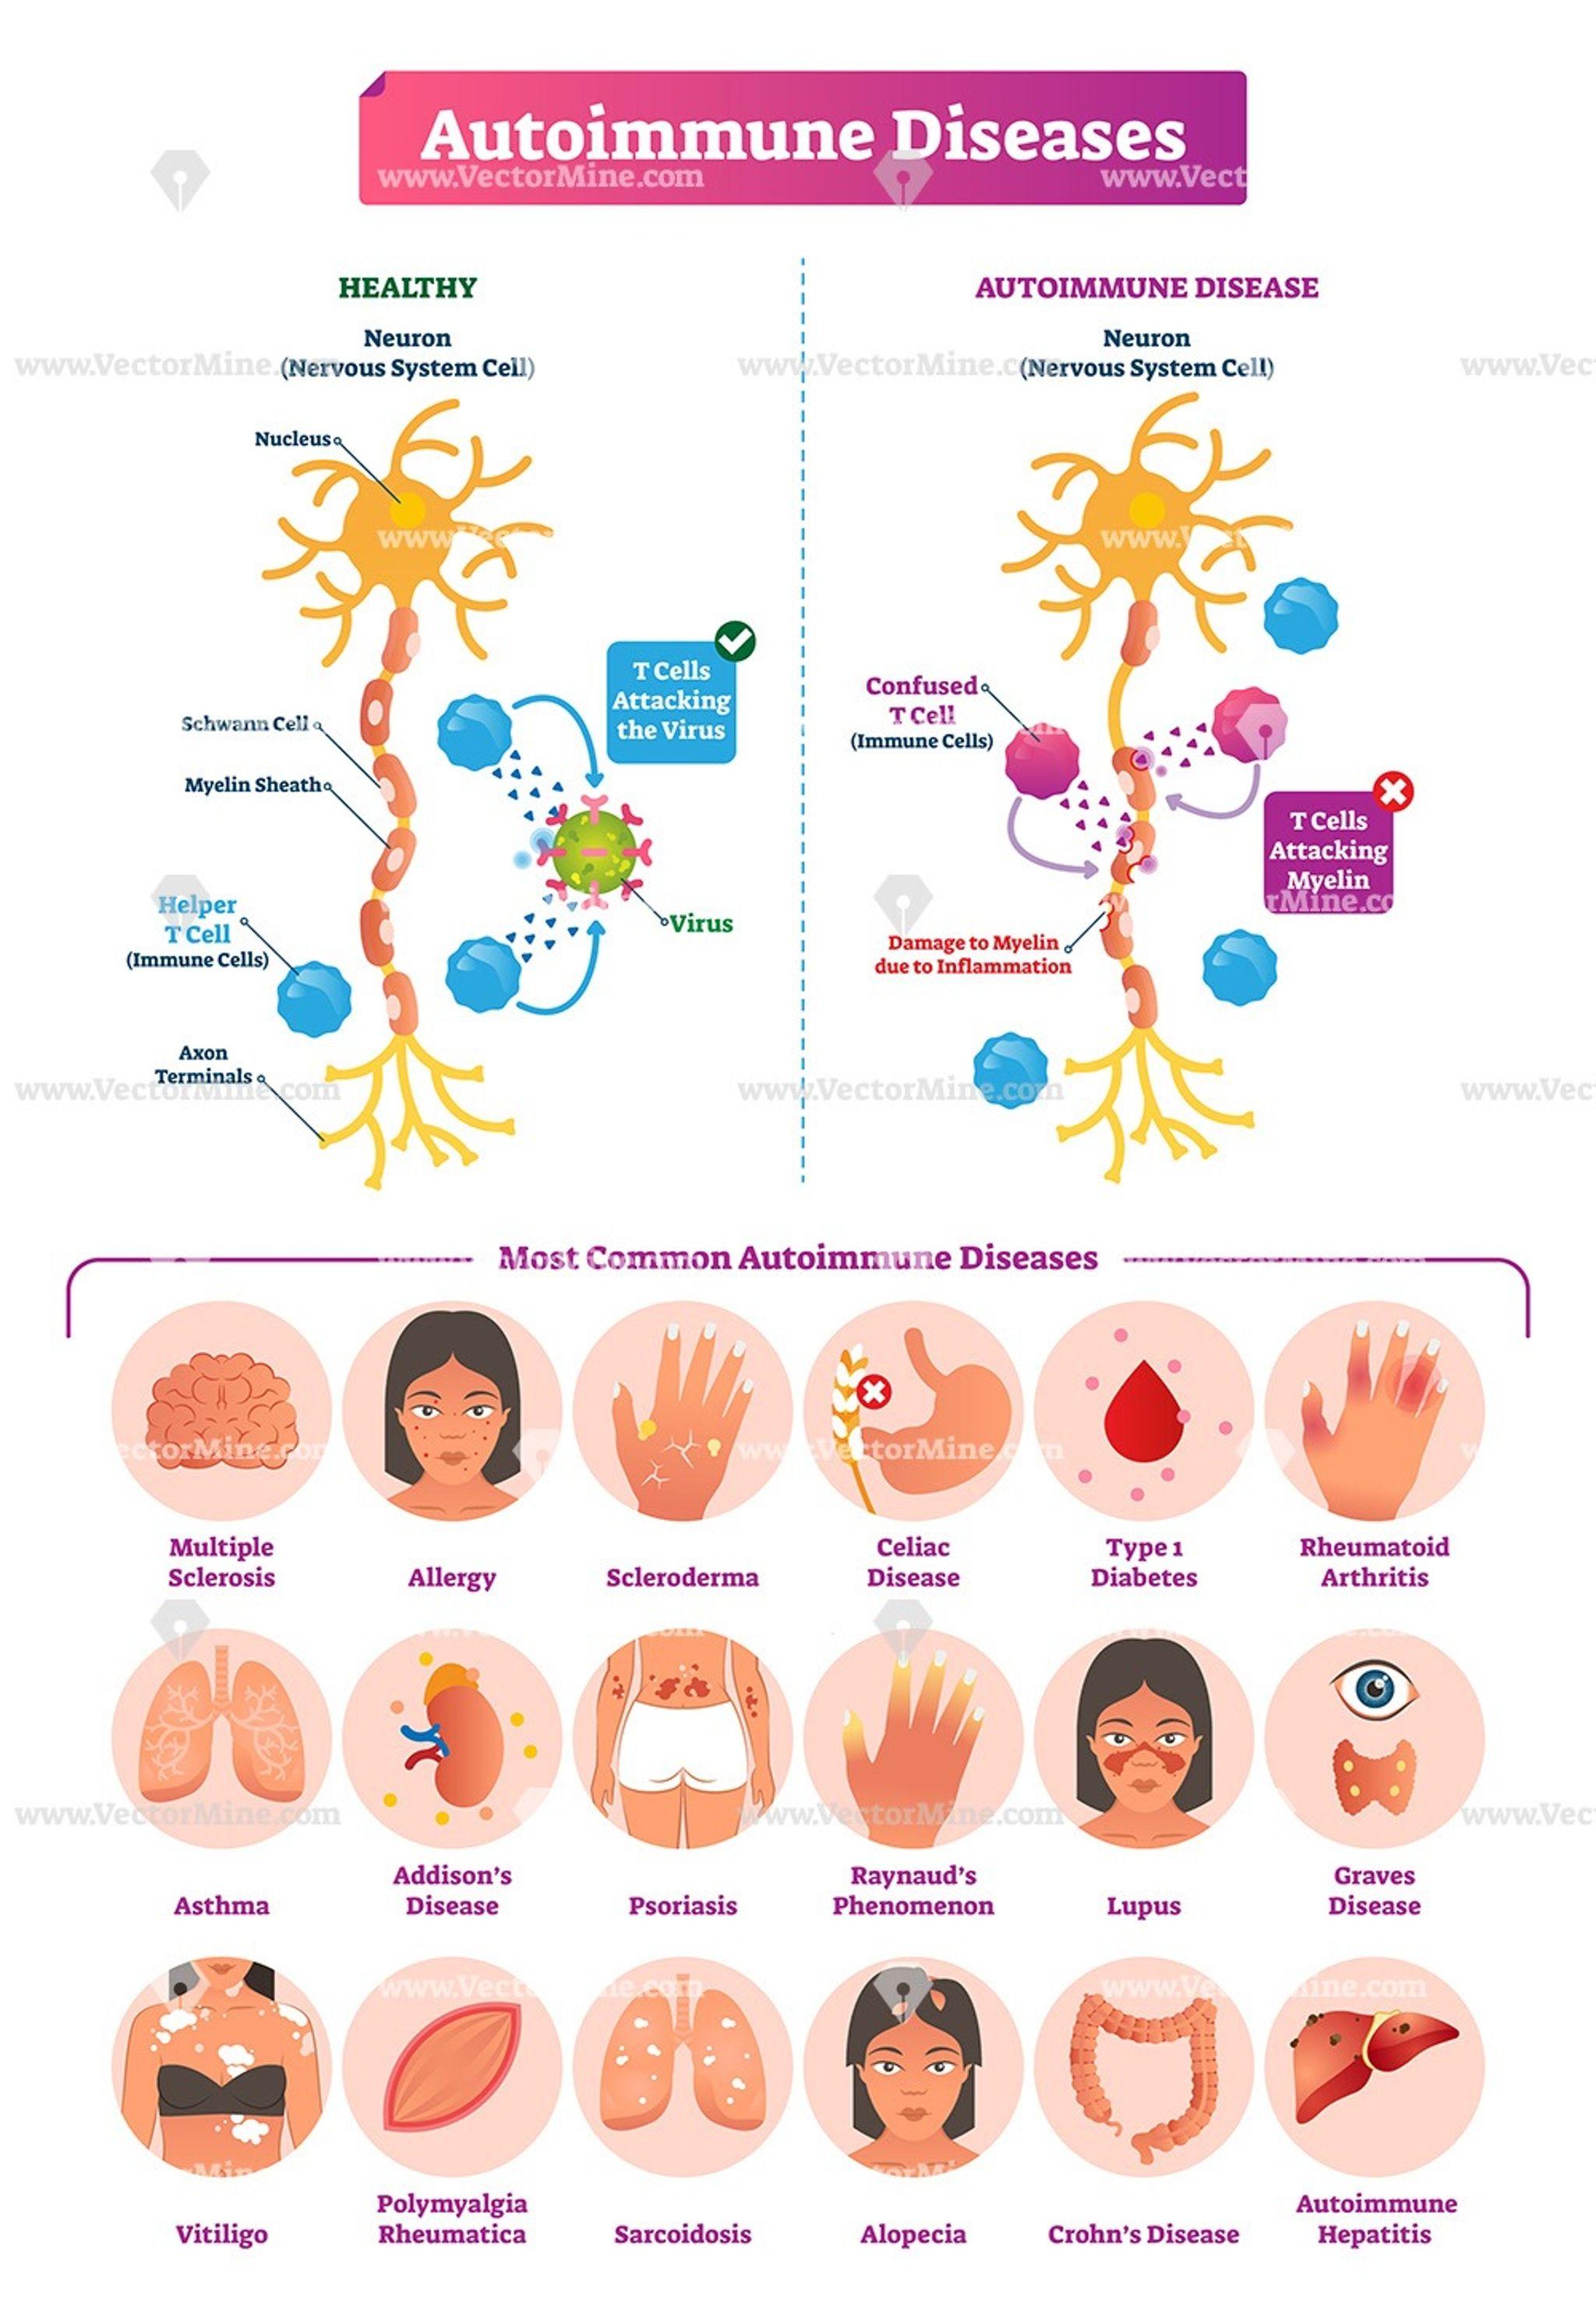 macularis arthrosis kezelés